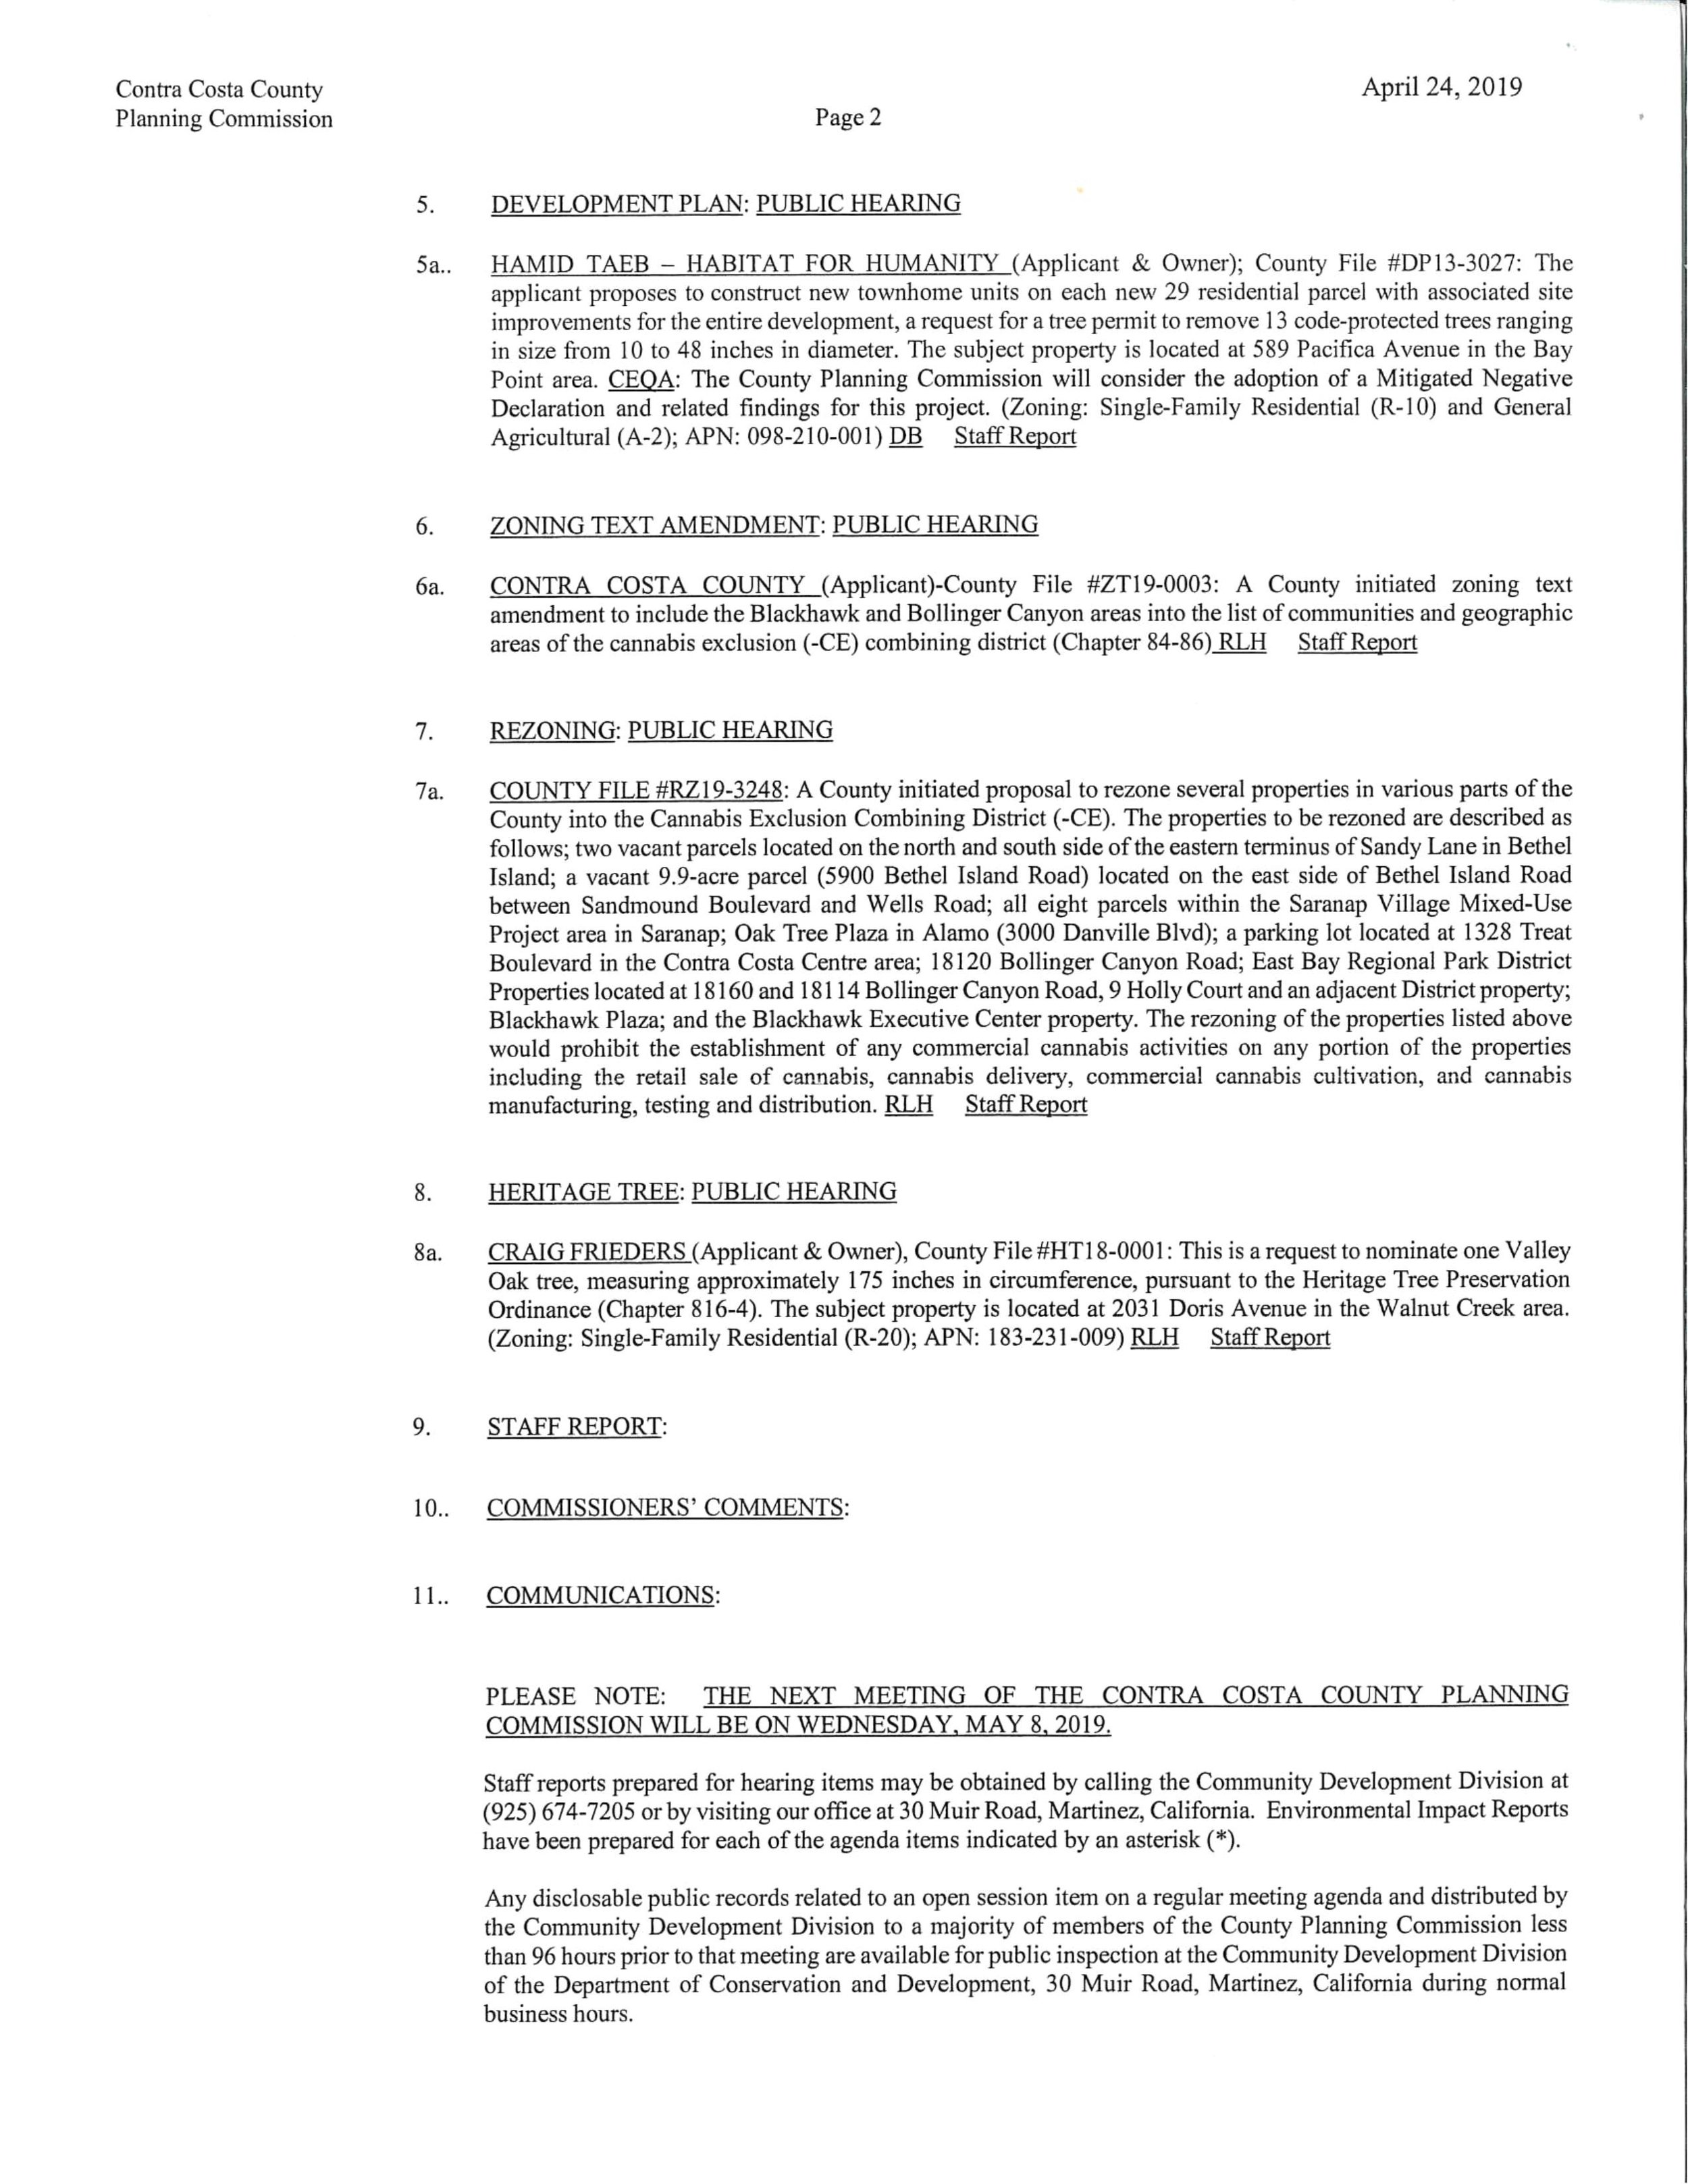 ESMAC Agenda 5.8.2019b_8.jpg